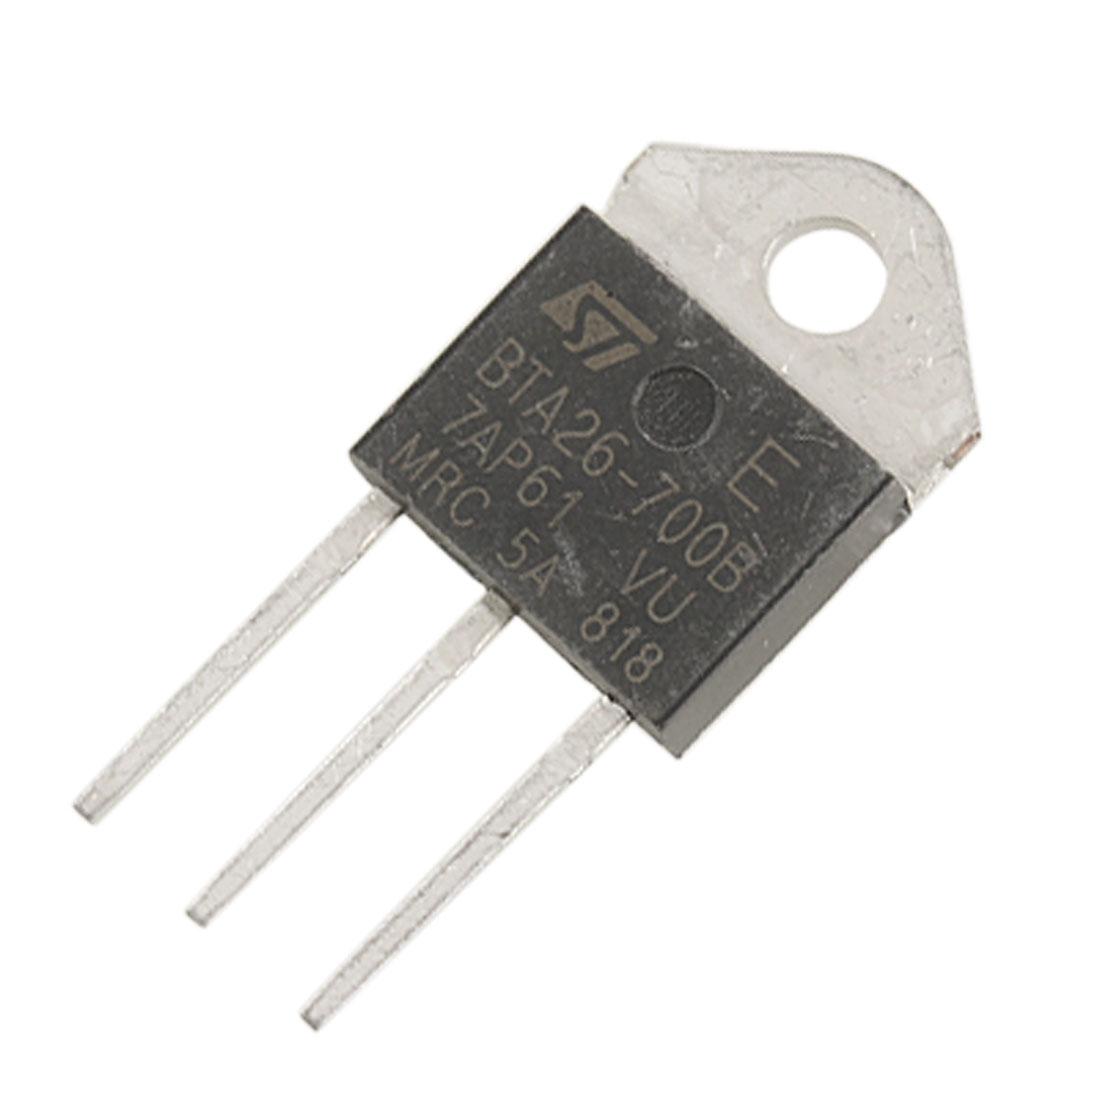 BTA26-700B 700V 25A 3 Pin Terminals Standard Triacs Thyristor TOP3